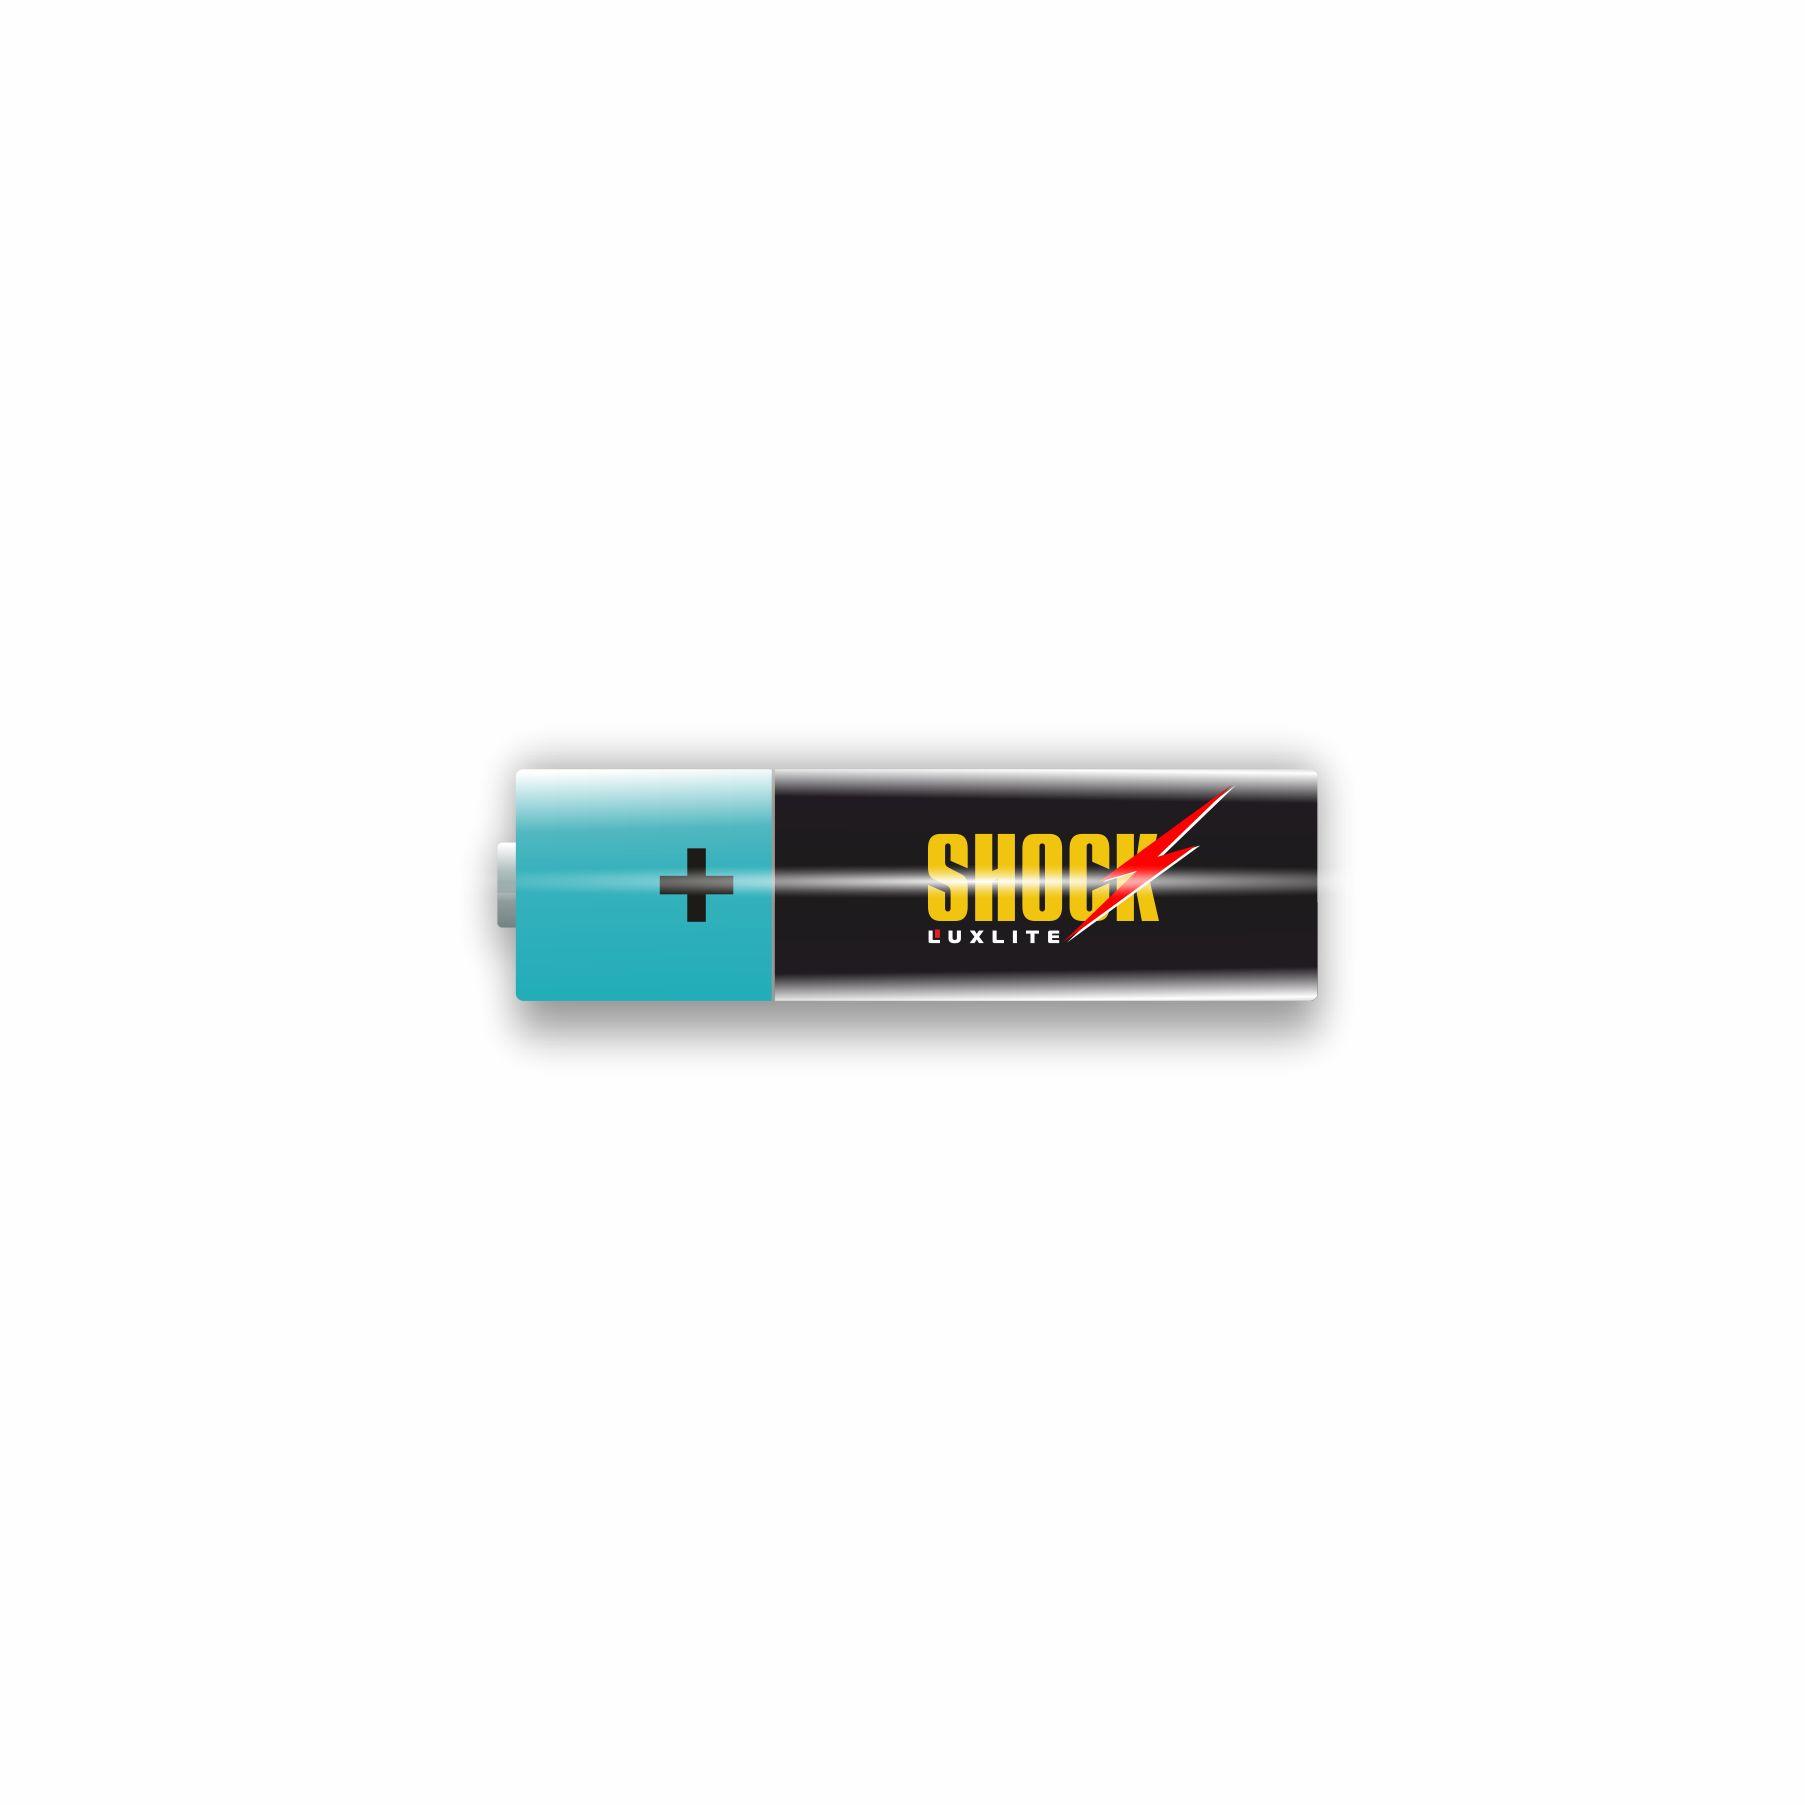 Логотип для батареек LUXLITE SHOCK - дизайнер ilim1973